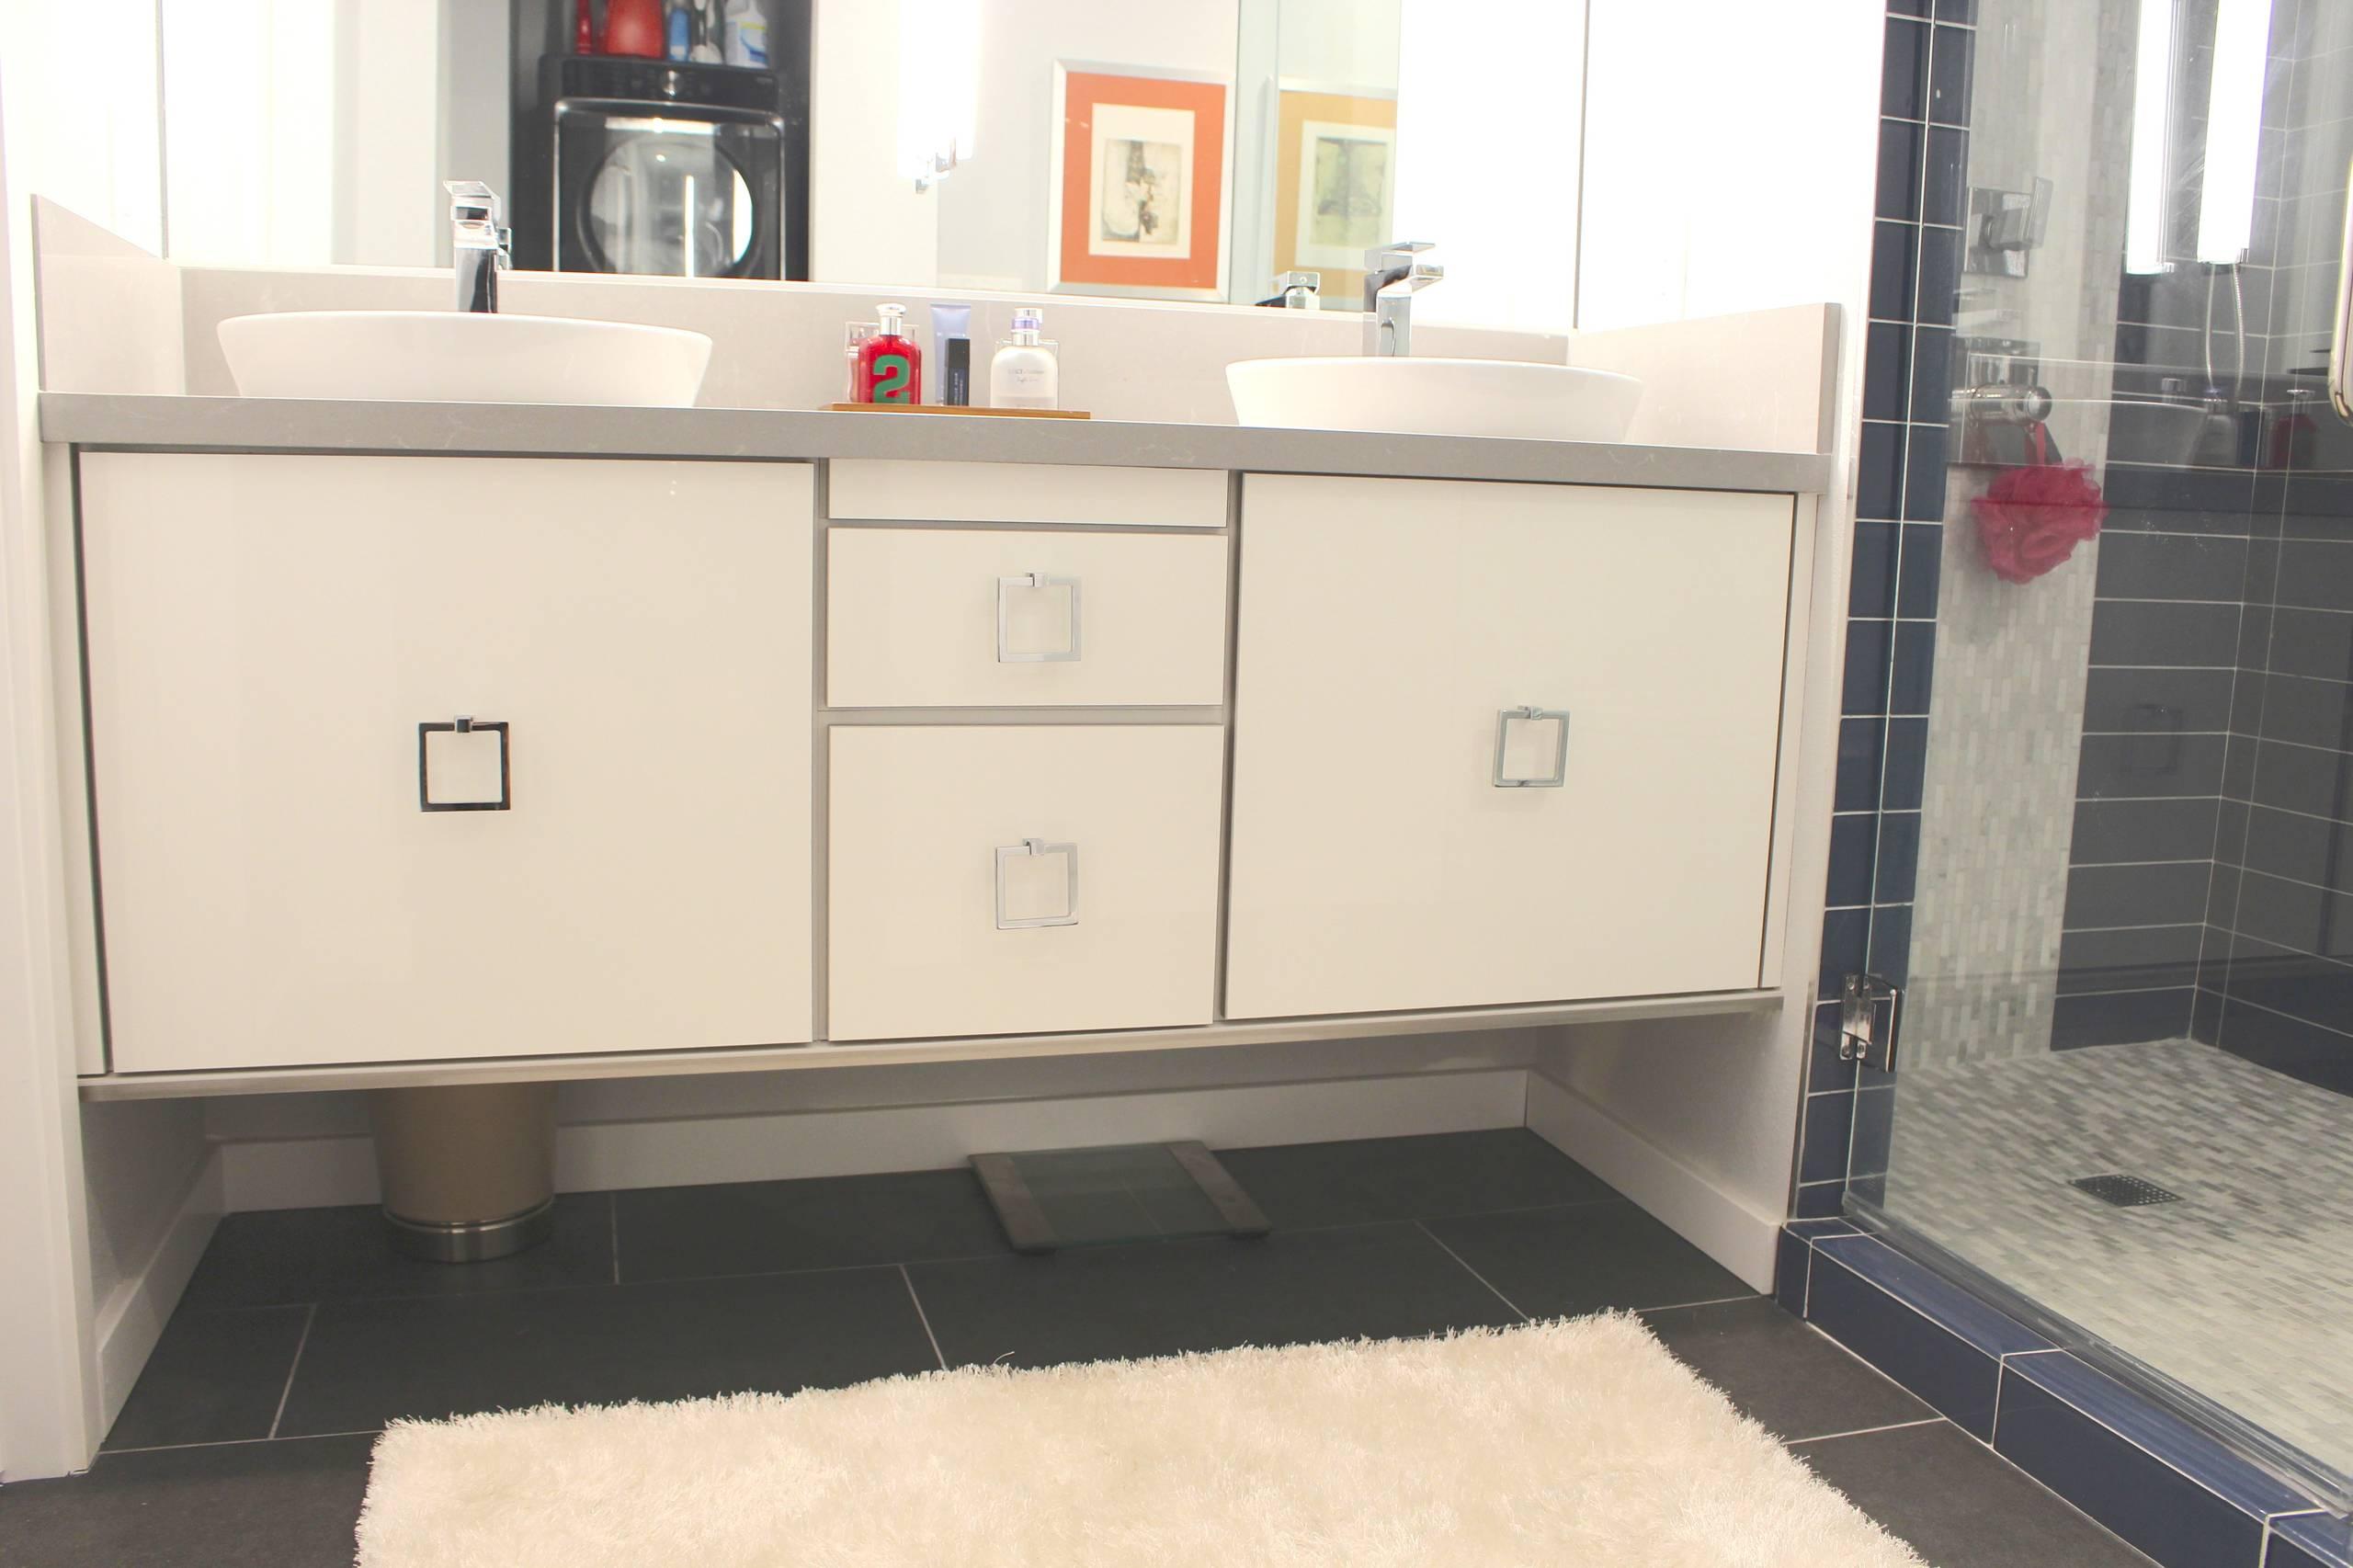 Modern Kitchen and Bathroom Remodel